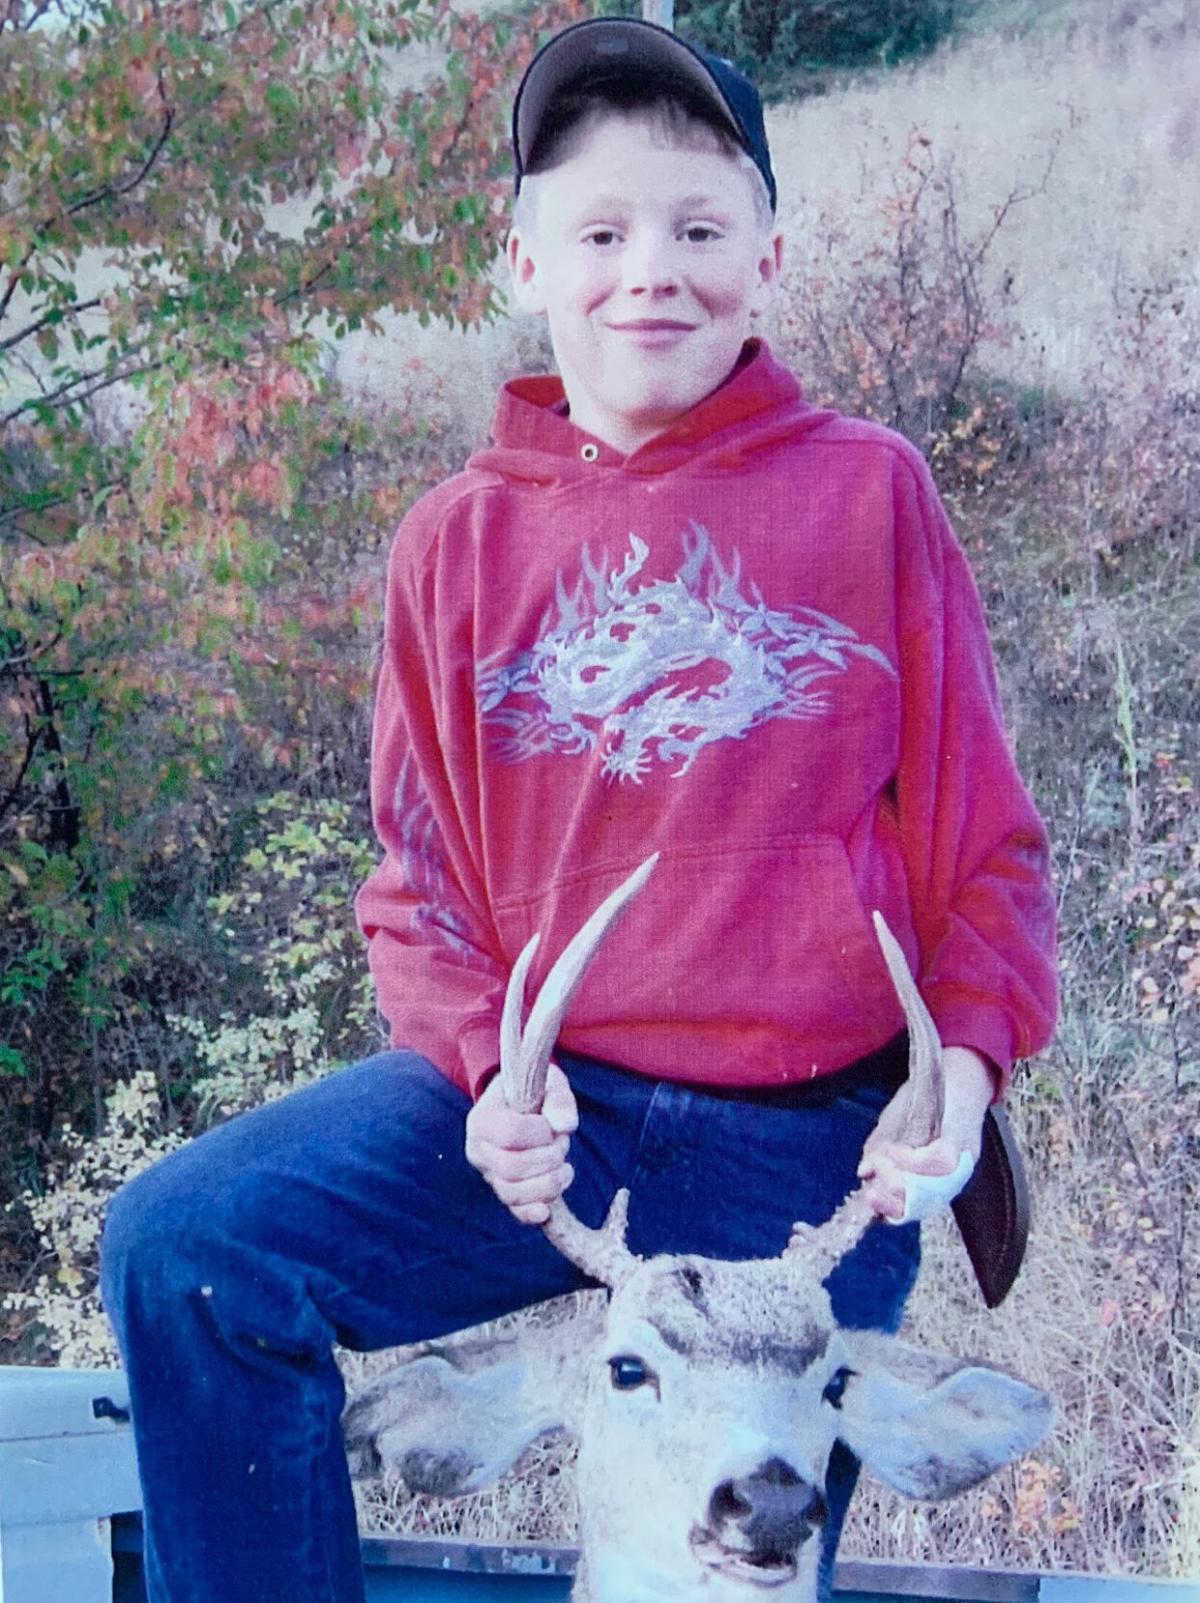 Reynolds childhood photo